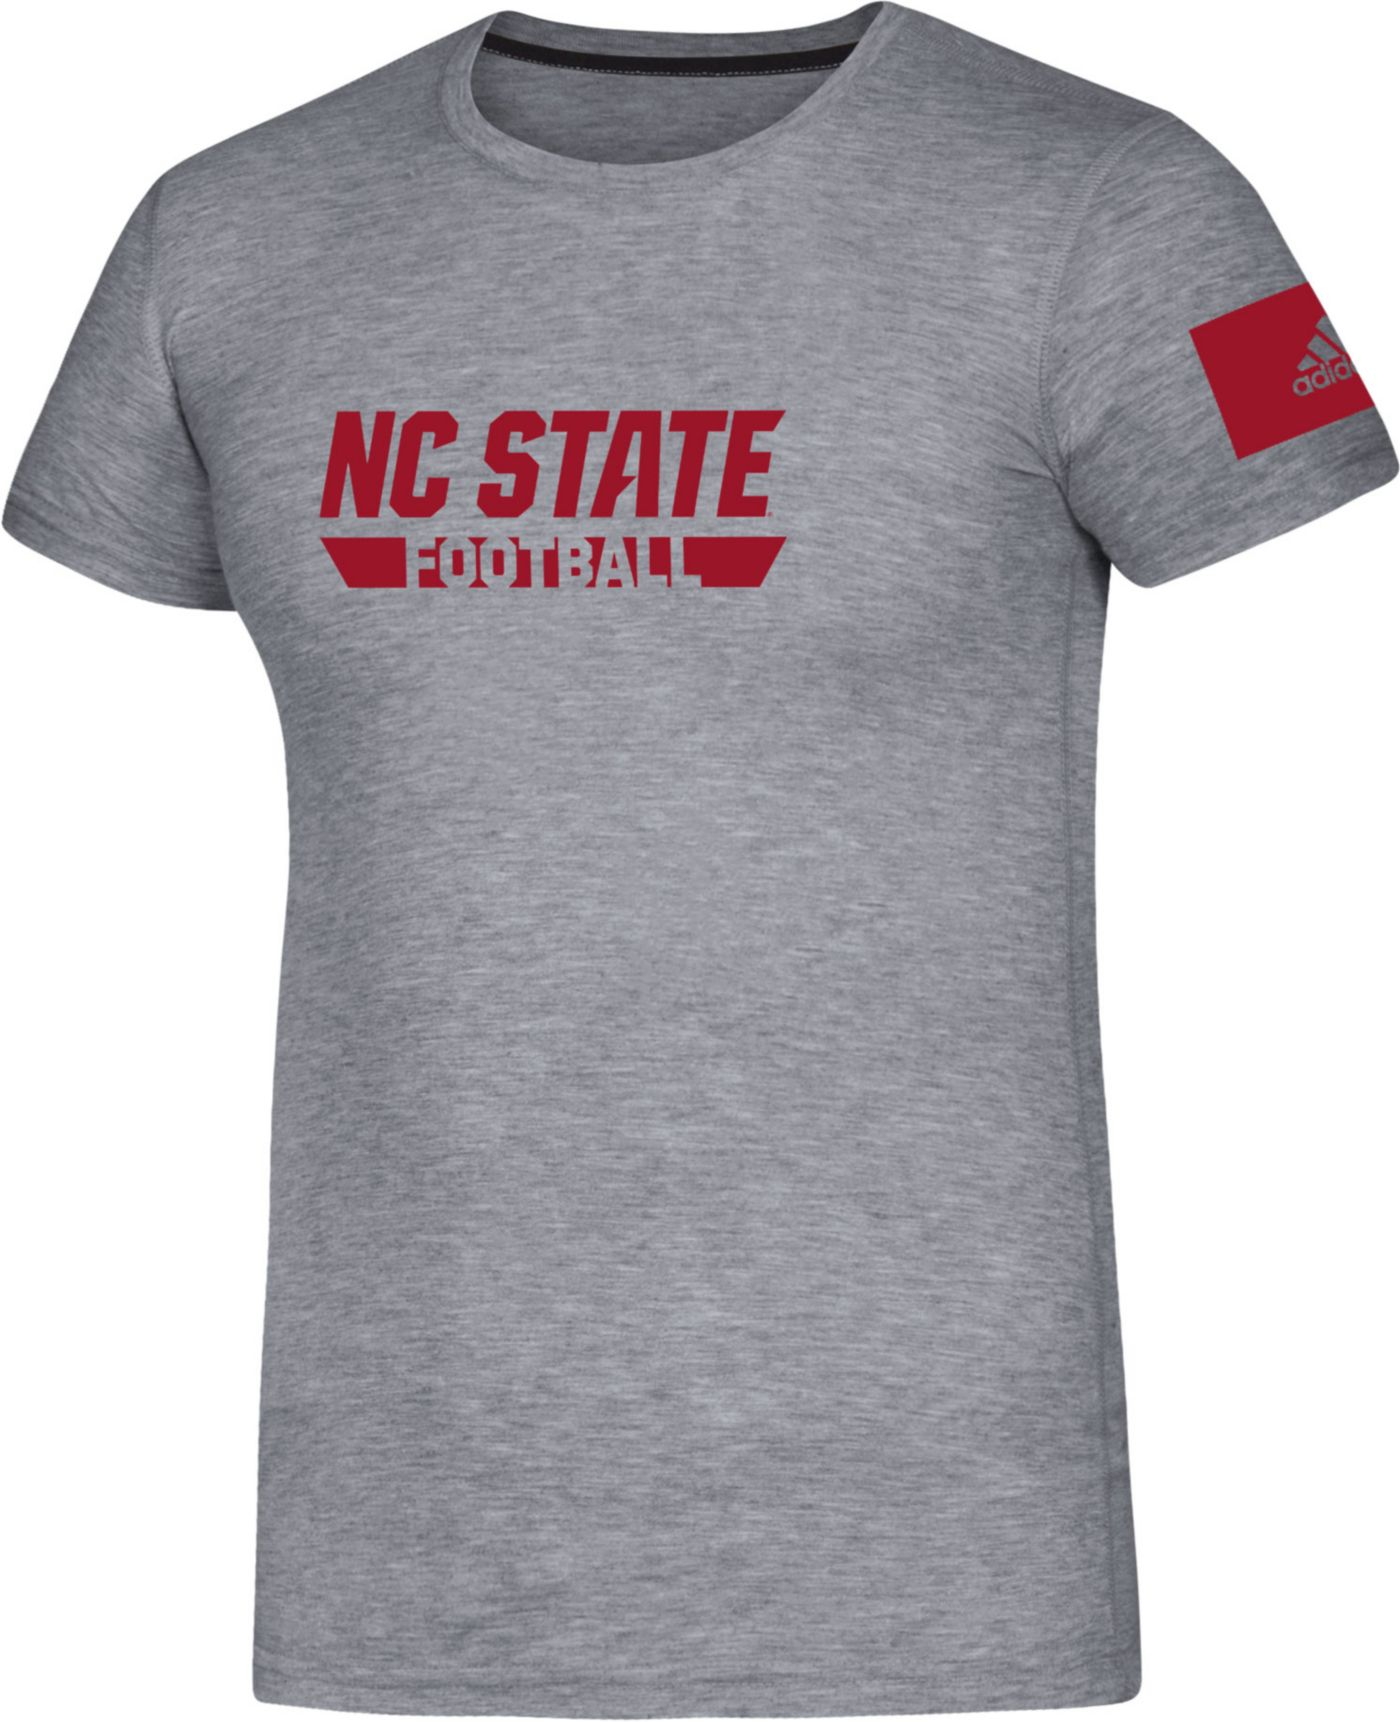 adidas Men's NC State Wolfpack Grey Locker Practice Football T-Shirt